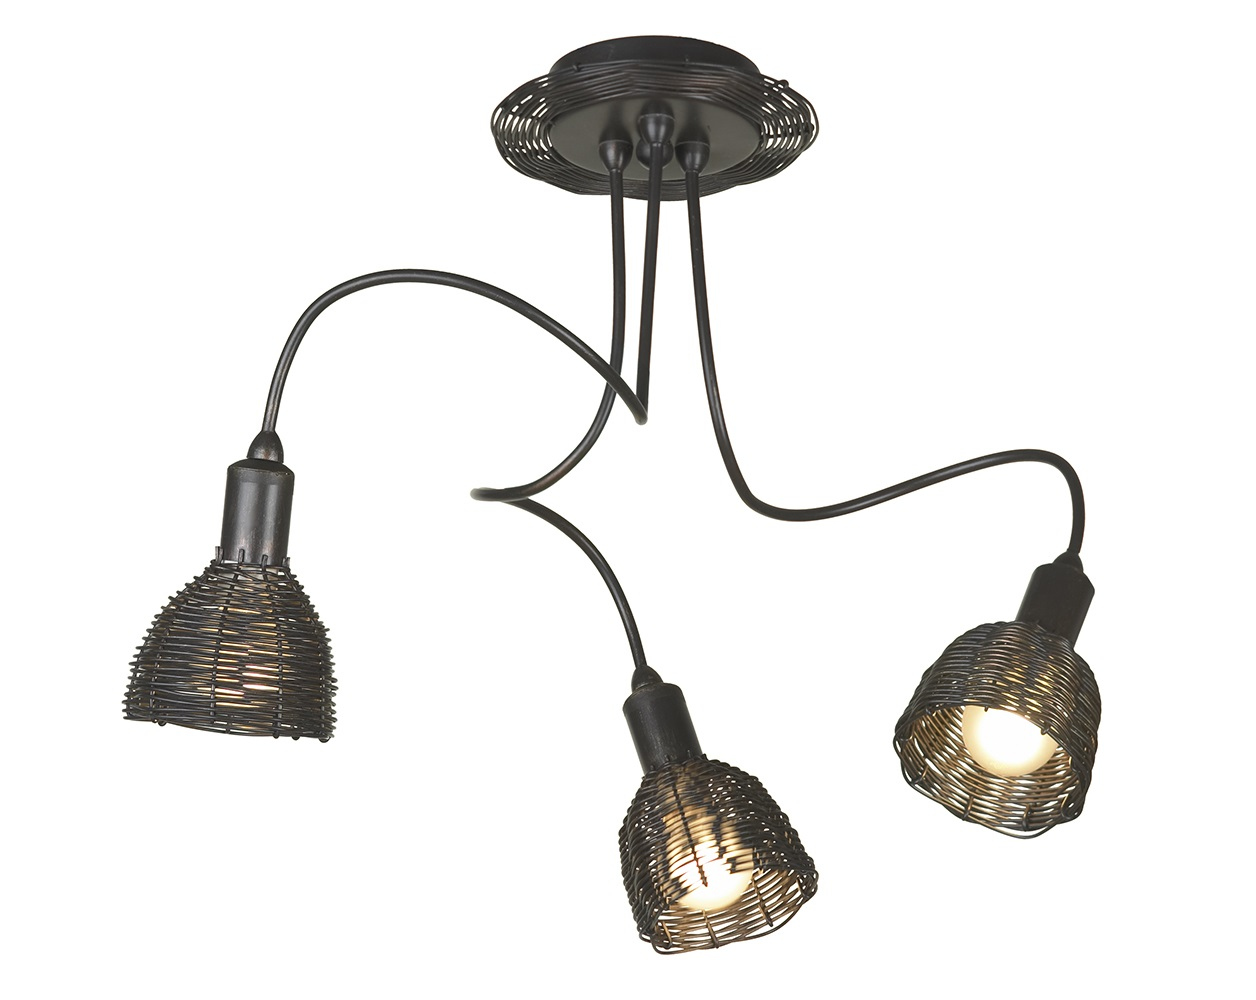 Потолочный светильникПотолочные светильники<br>&amp;lt;div&amp;gt;Вид цоколя: E14&amp;lt;/div&amp;gt;&amp;lt;div&amp;gt;Мощность: 40W&amp;lt;/div&amp;gt;&amp;lt;div&amp;gt;Количество ламп: 3&amp;lt;/div&amp;gt;&amp;lt;div&amp;gt;Лампочка в комплекте: нет&amp;lt;/div&amp;gt;<br><br>Material: Металл<br>Width см: None<br>Height см: 35<br>Diameter см: 45